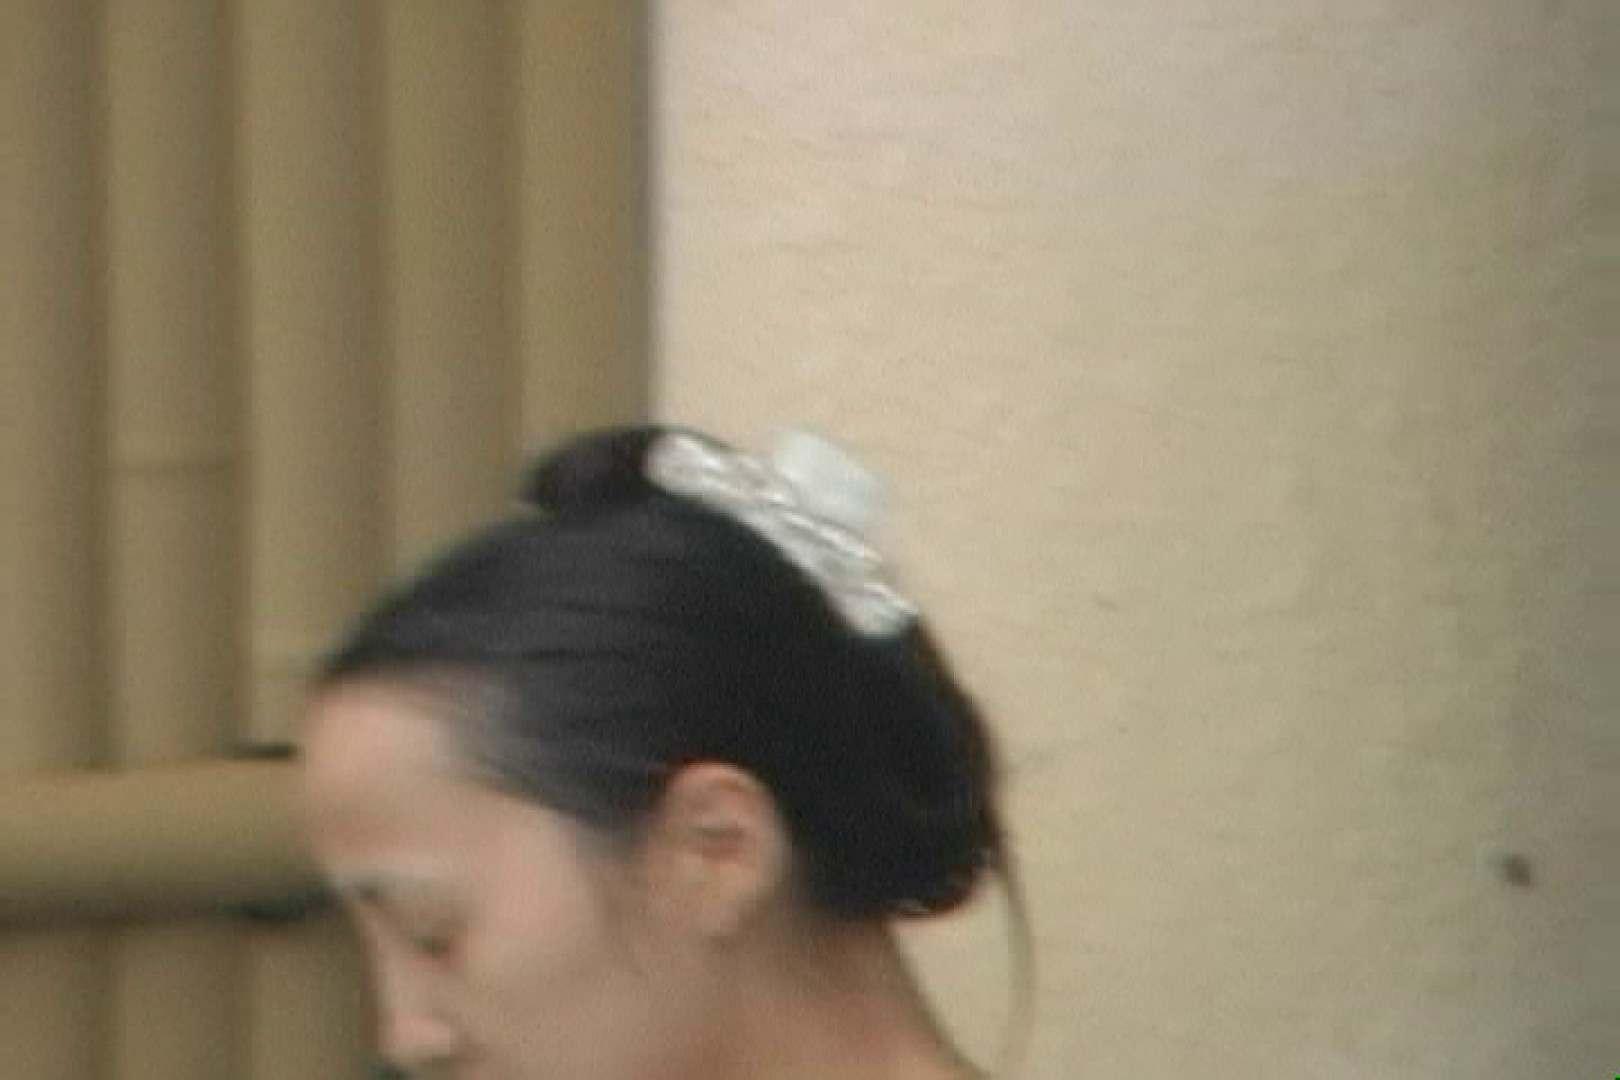 Aquaな露天風呂Vol.41 盗撮 戯れ無修正画像 89枚 62